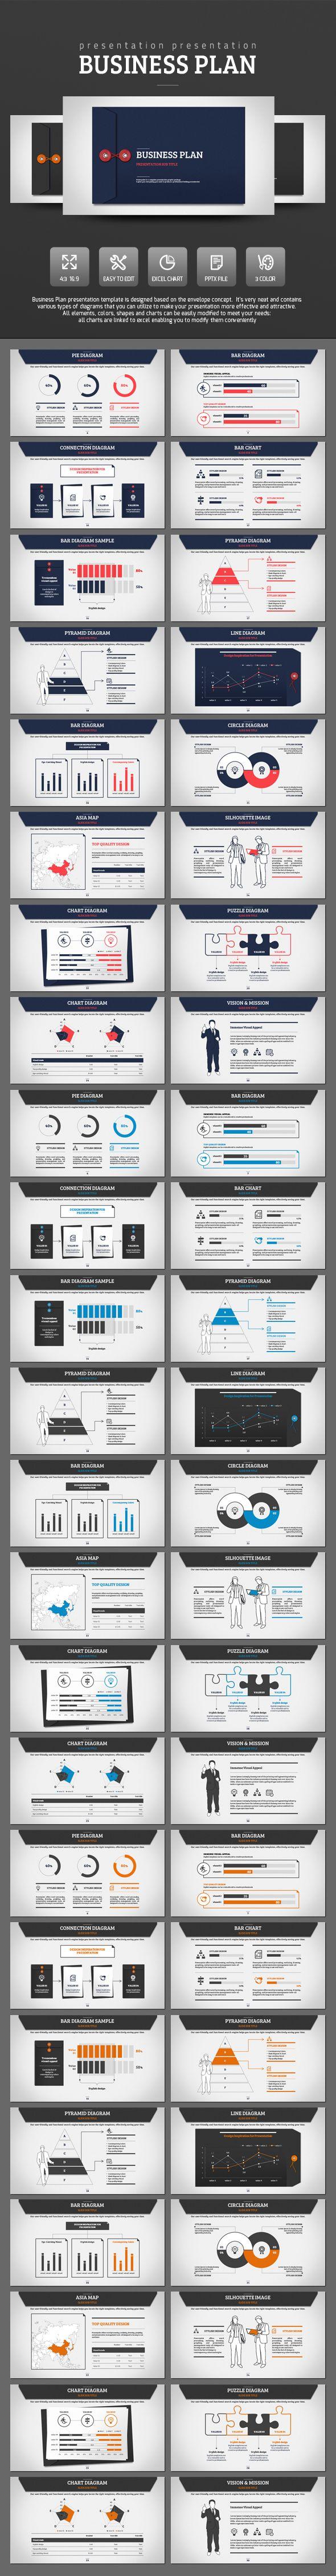 Business Plan - PowerPoint Templates Presentation Templates